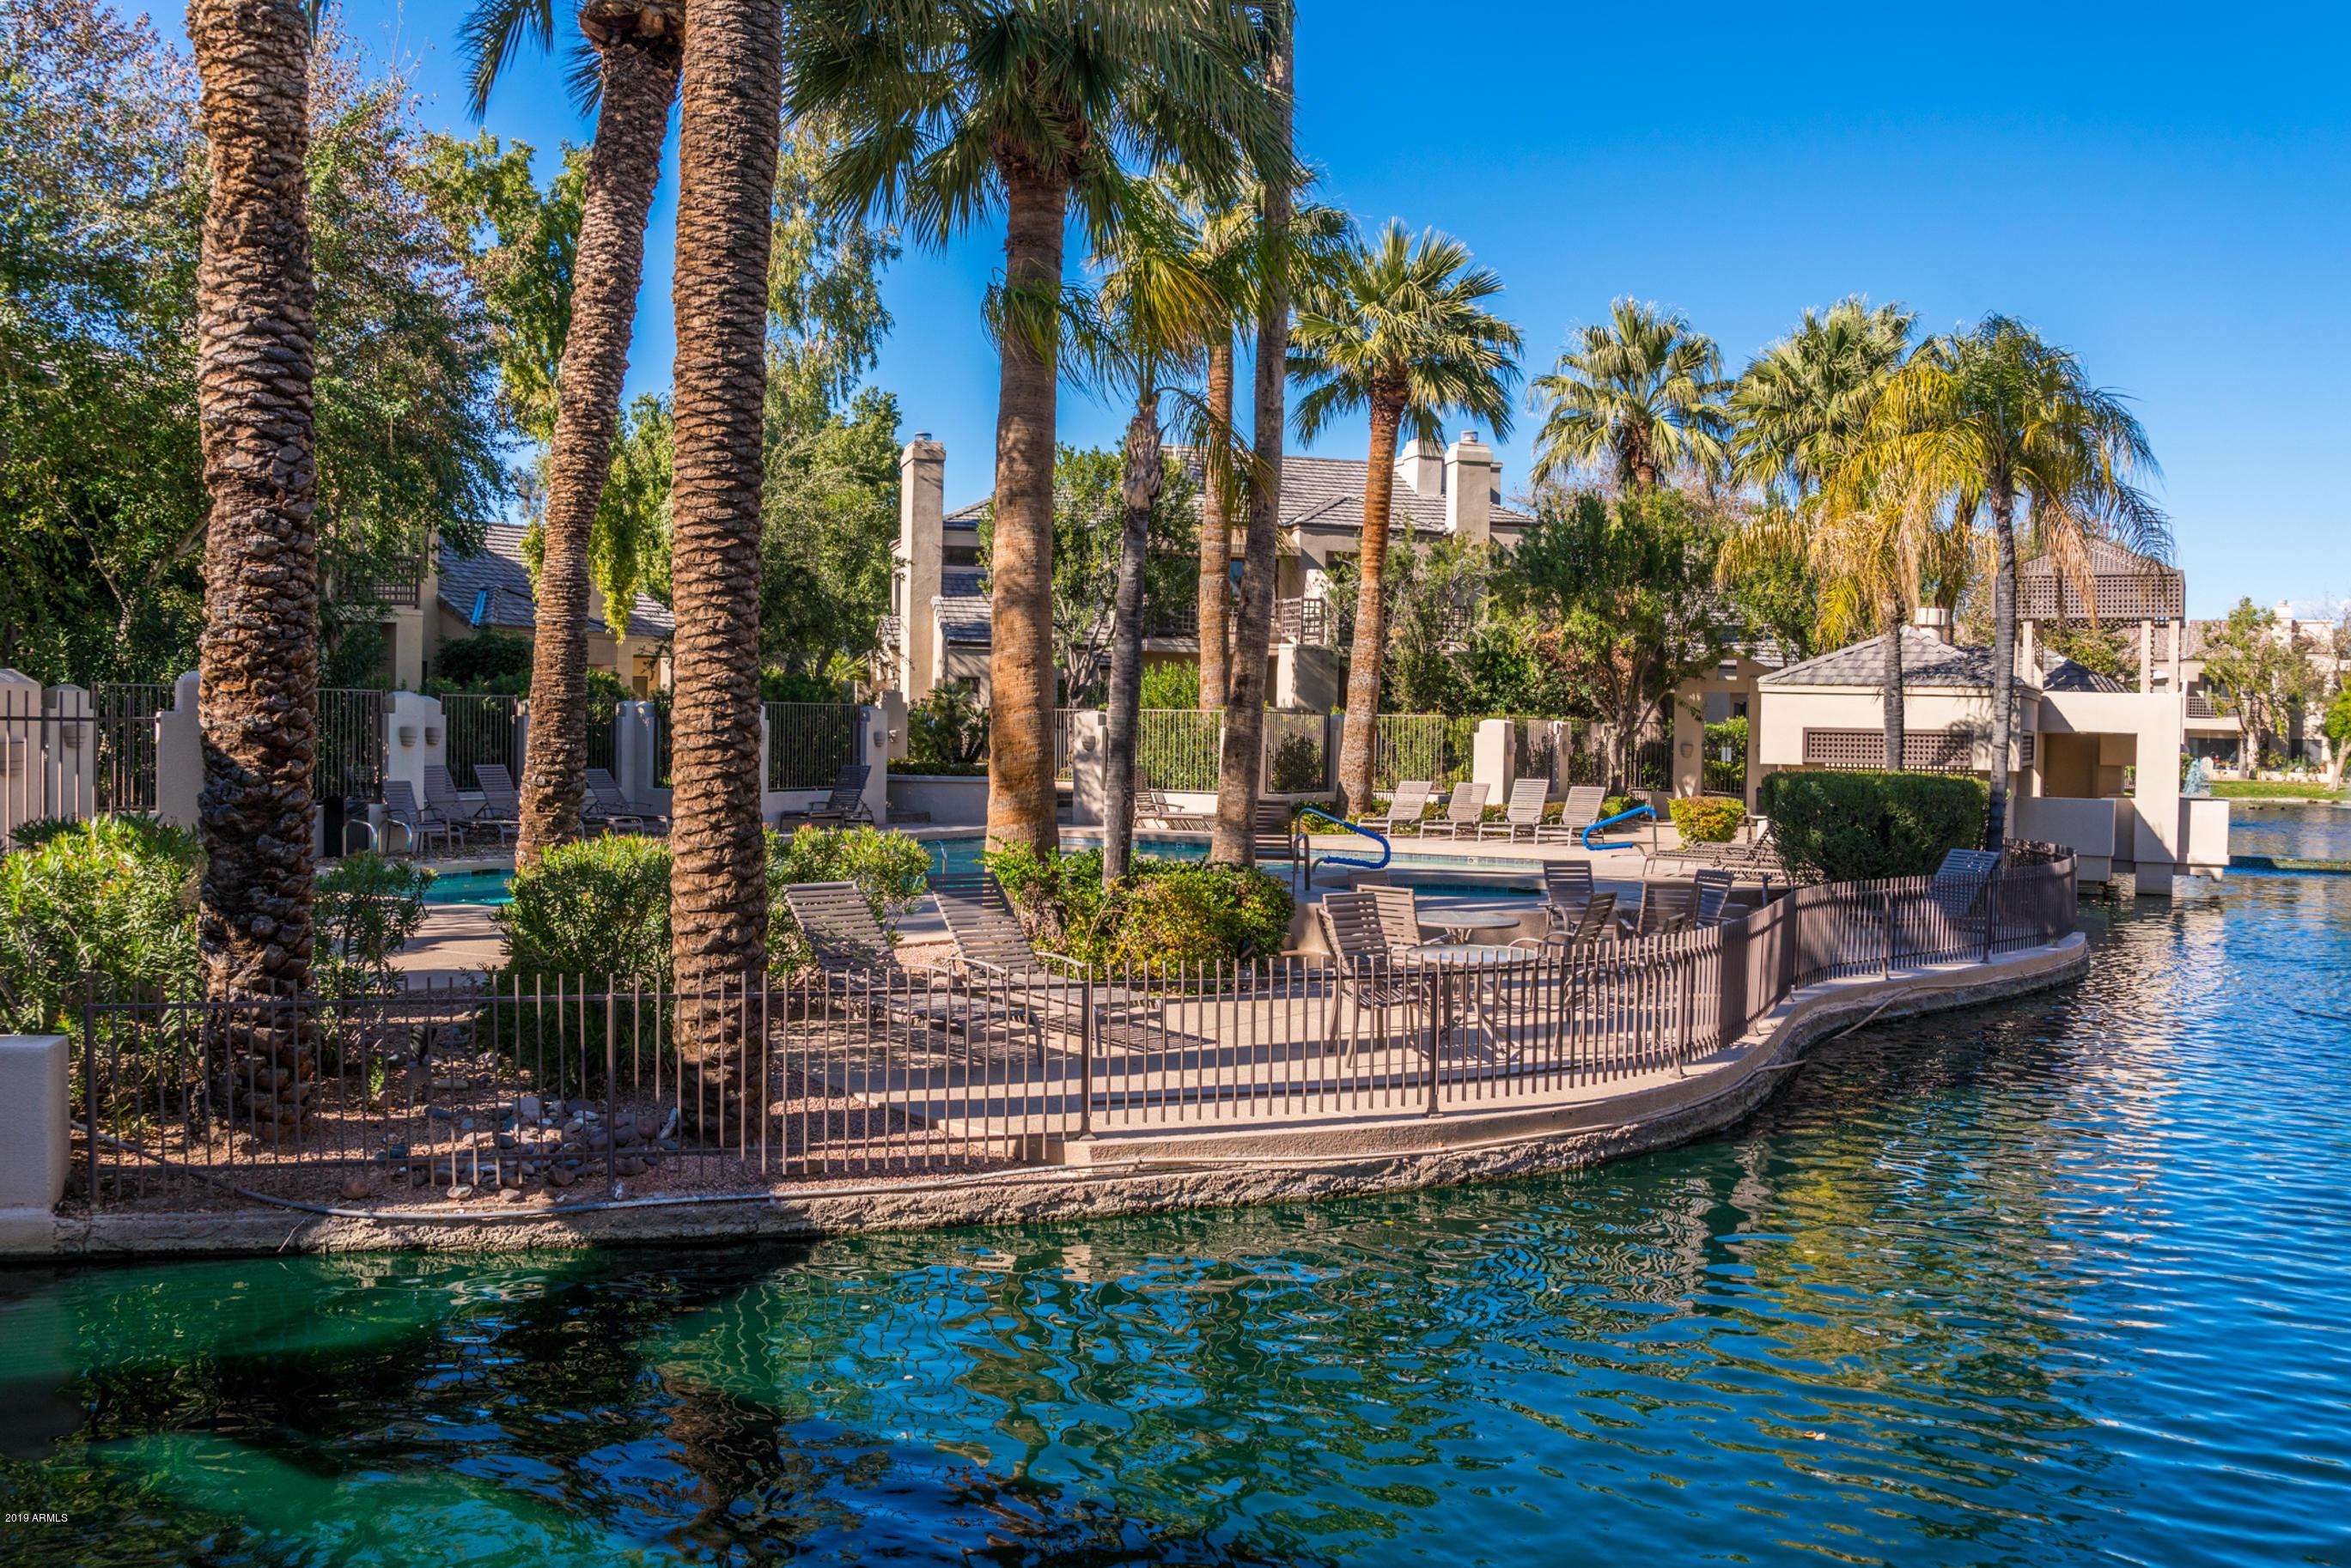 Photo of 7272 E GAINEY RANCH Road #102, Scottsdale, AZ 85258